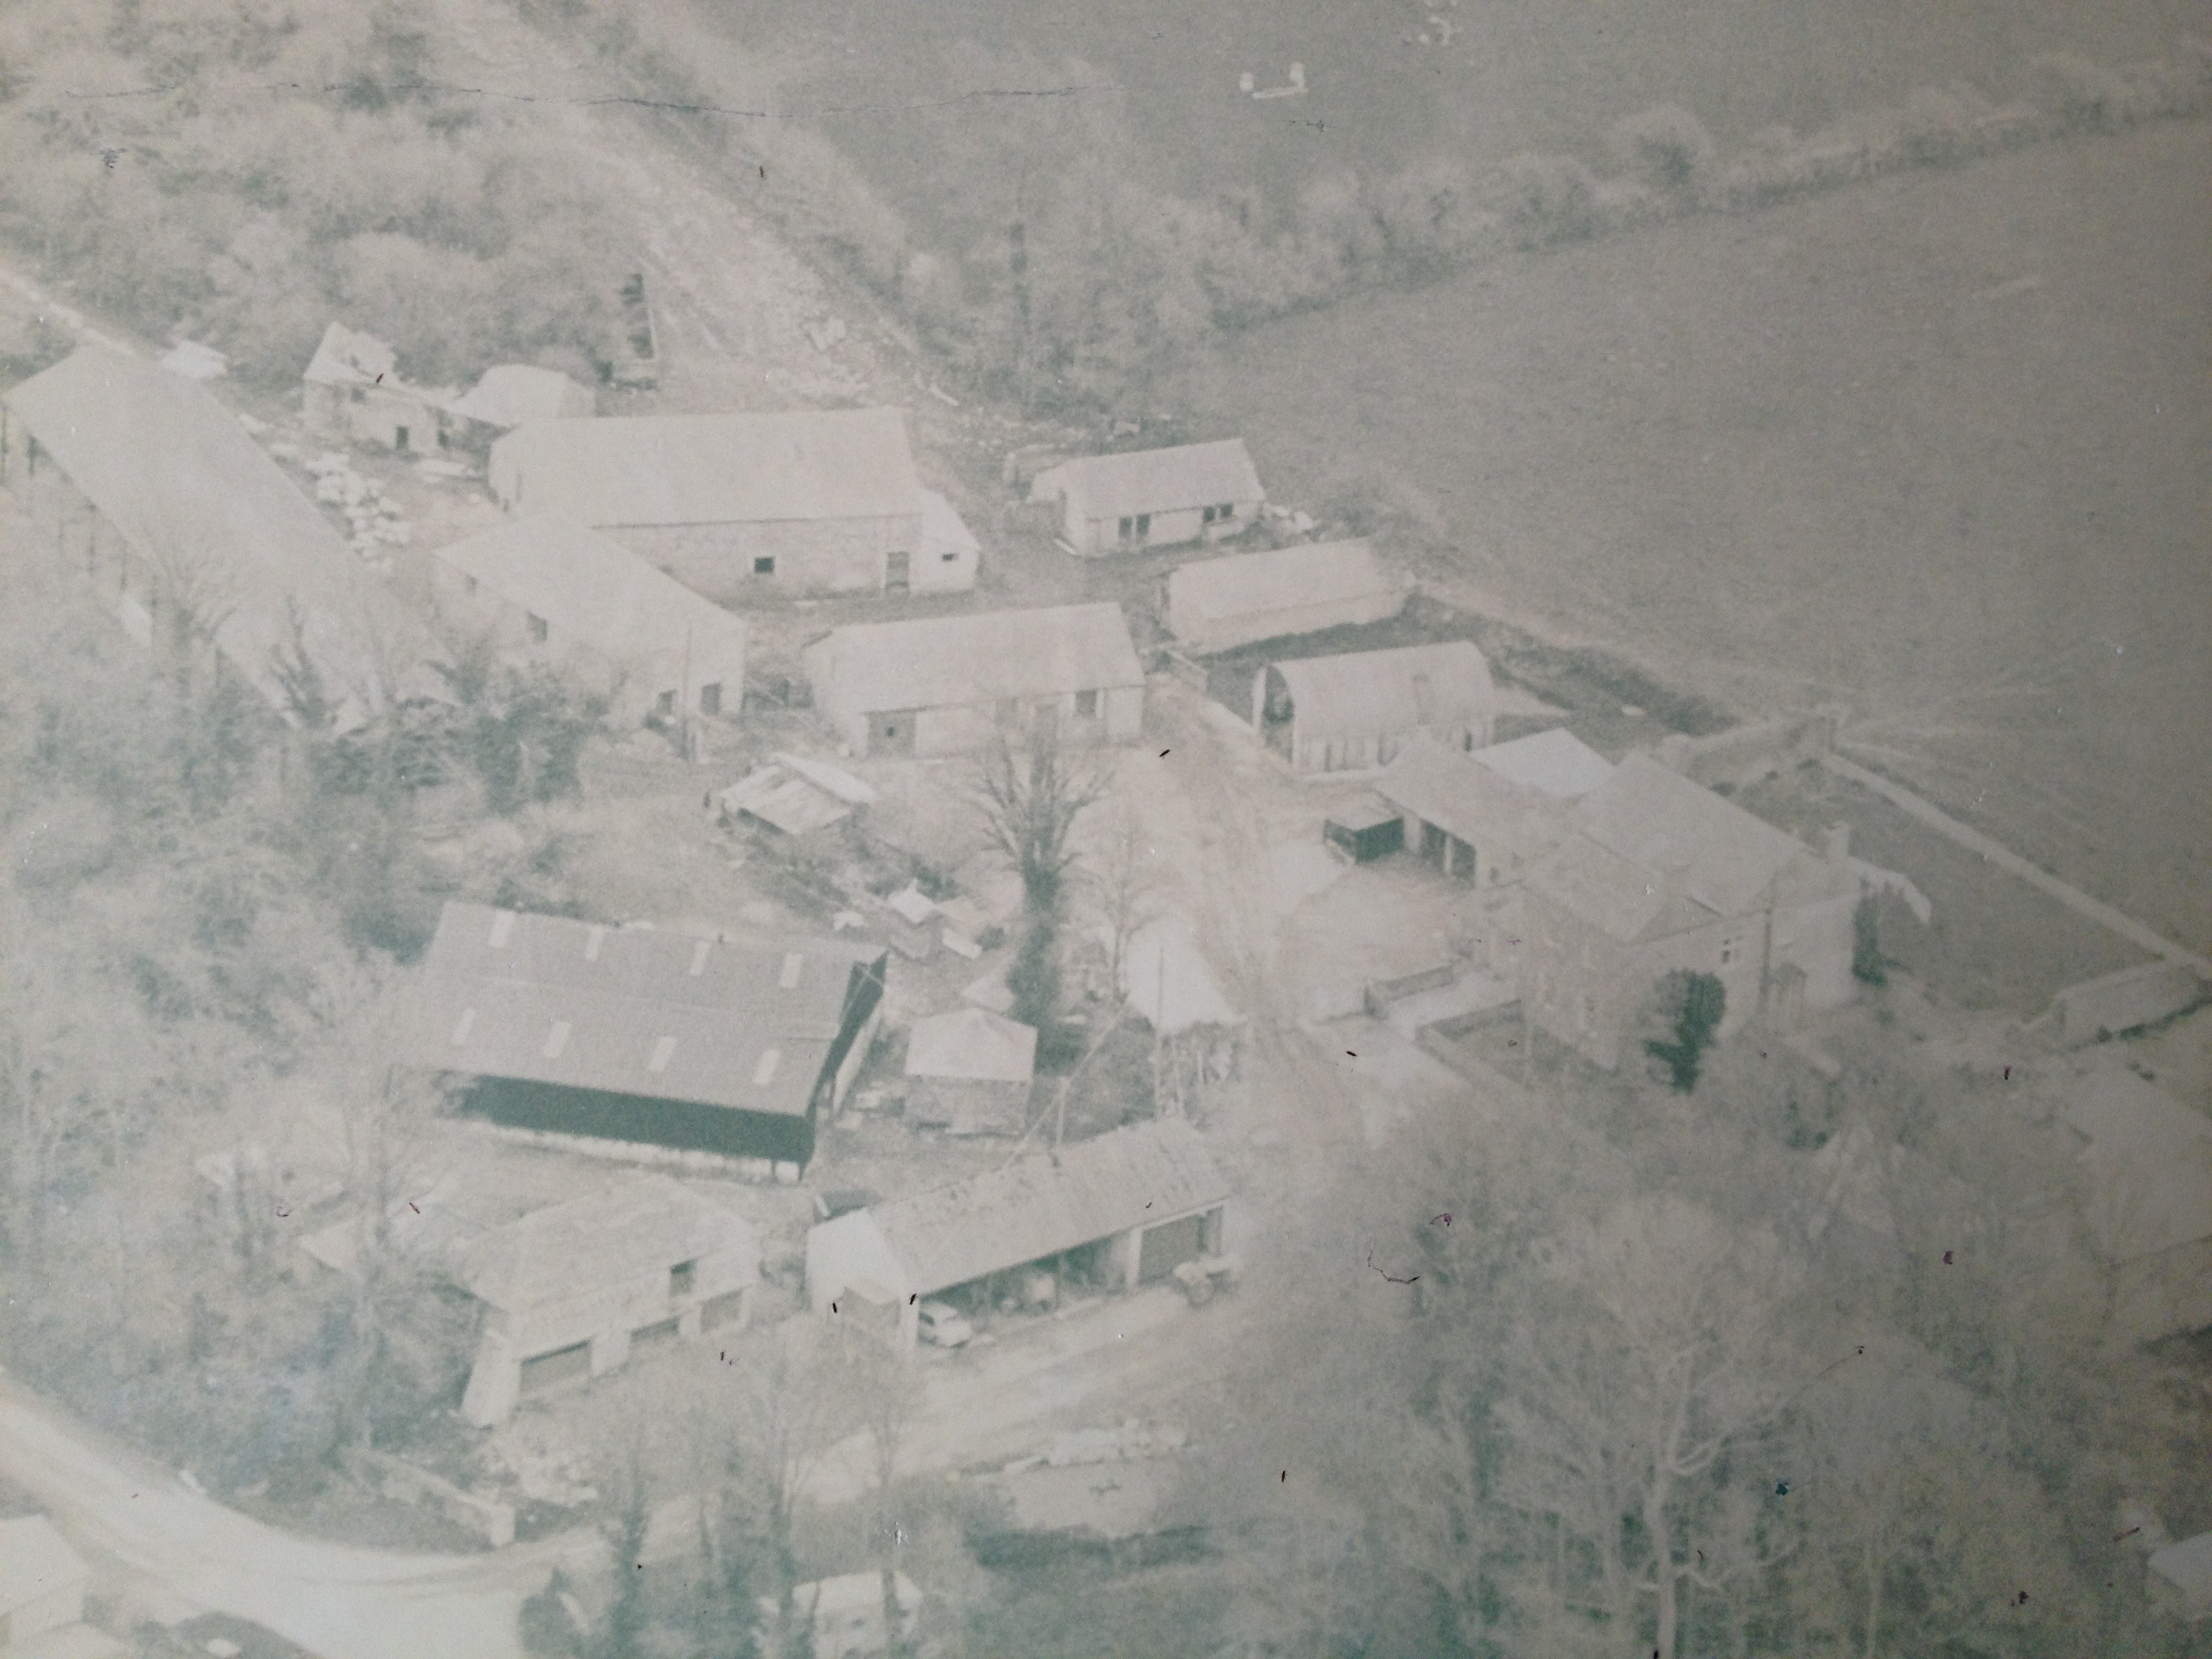 Penpont farm